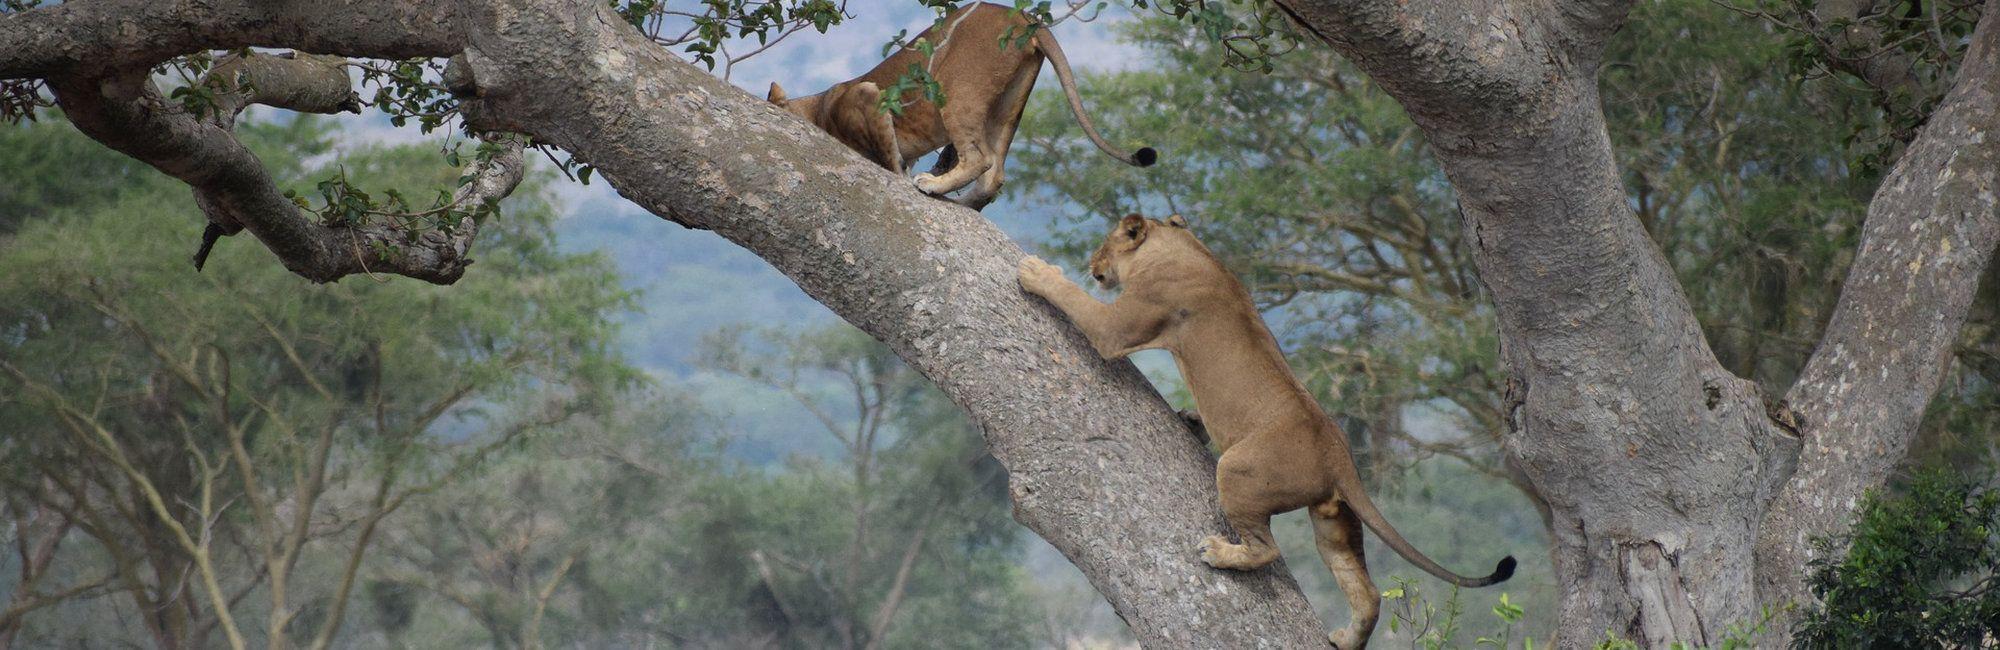 Oeganda Leeuwen in boom